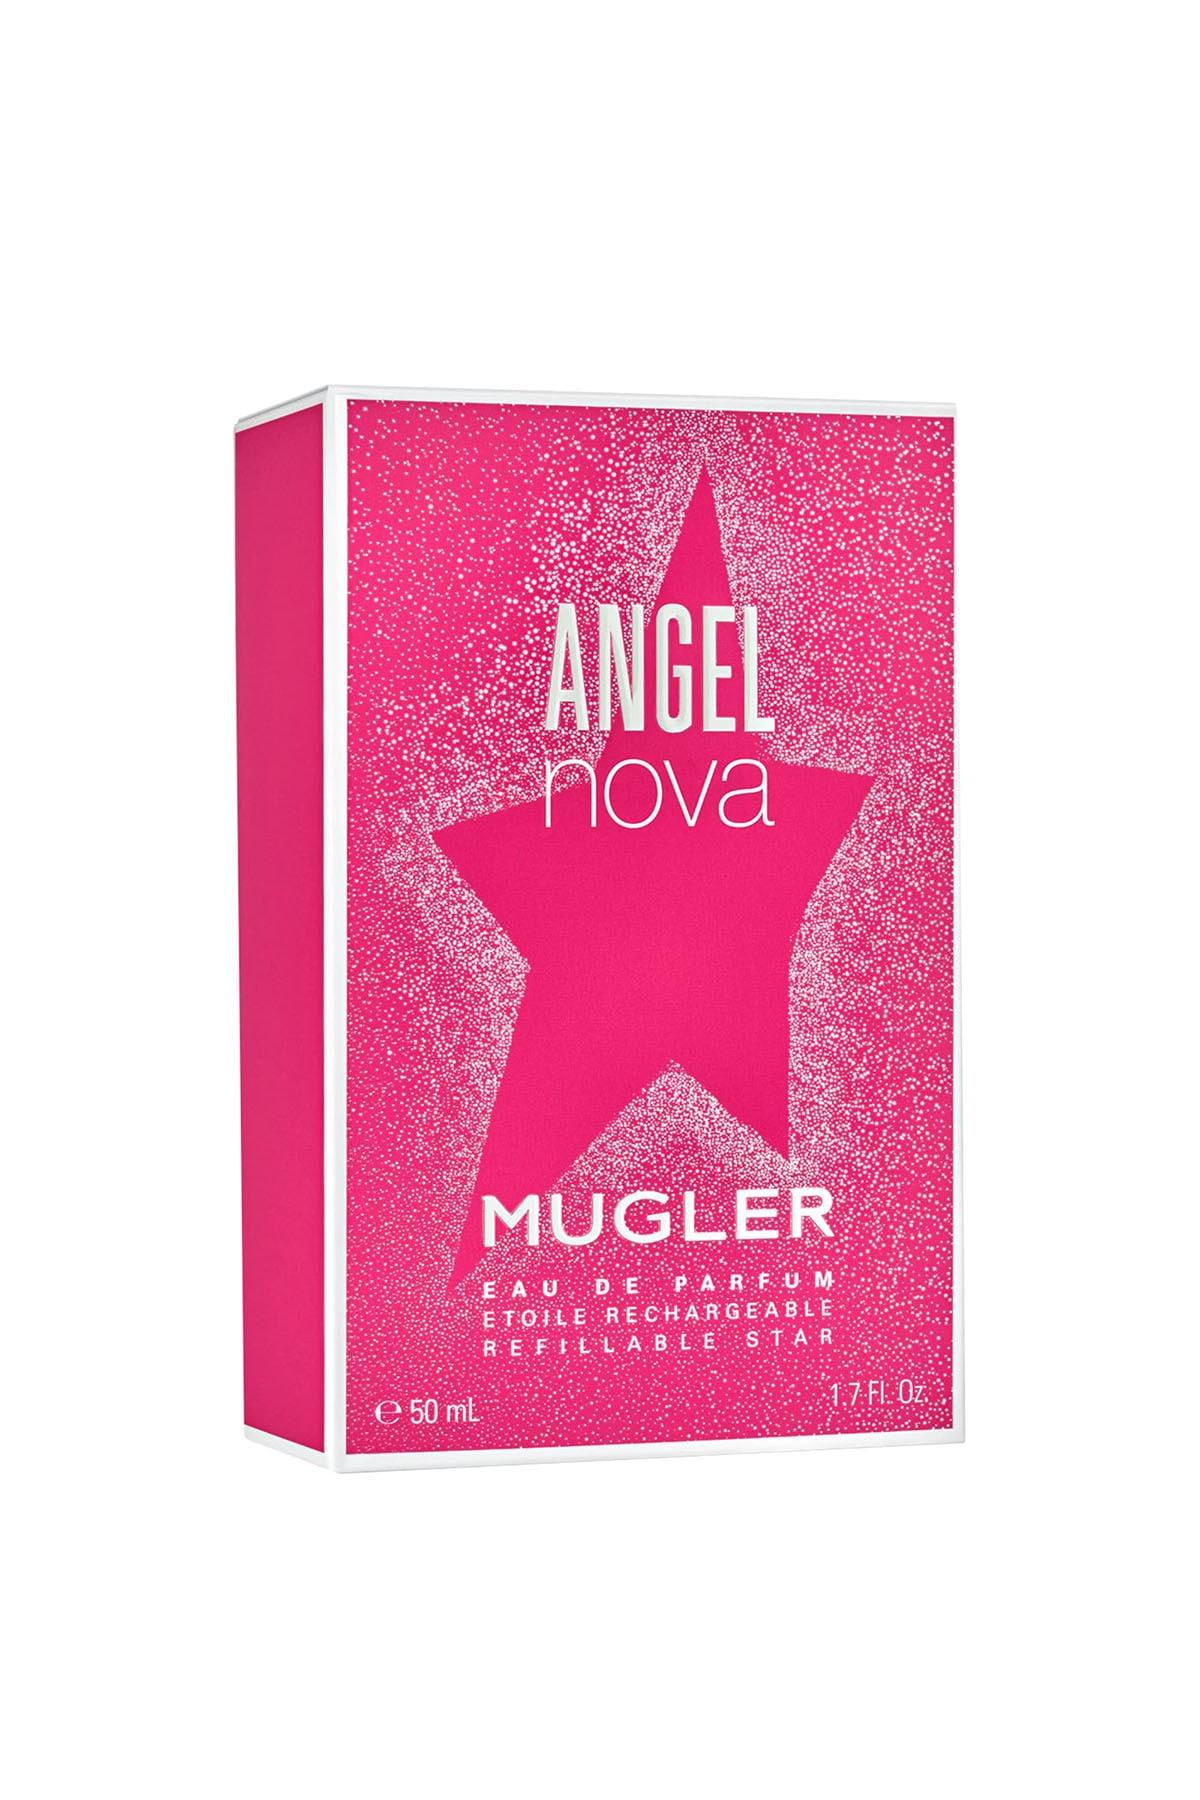 Thierry Mugler Angel Nova Edp 50 ml Kadın Parfümü 3439600049855 1